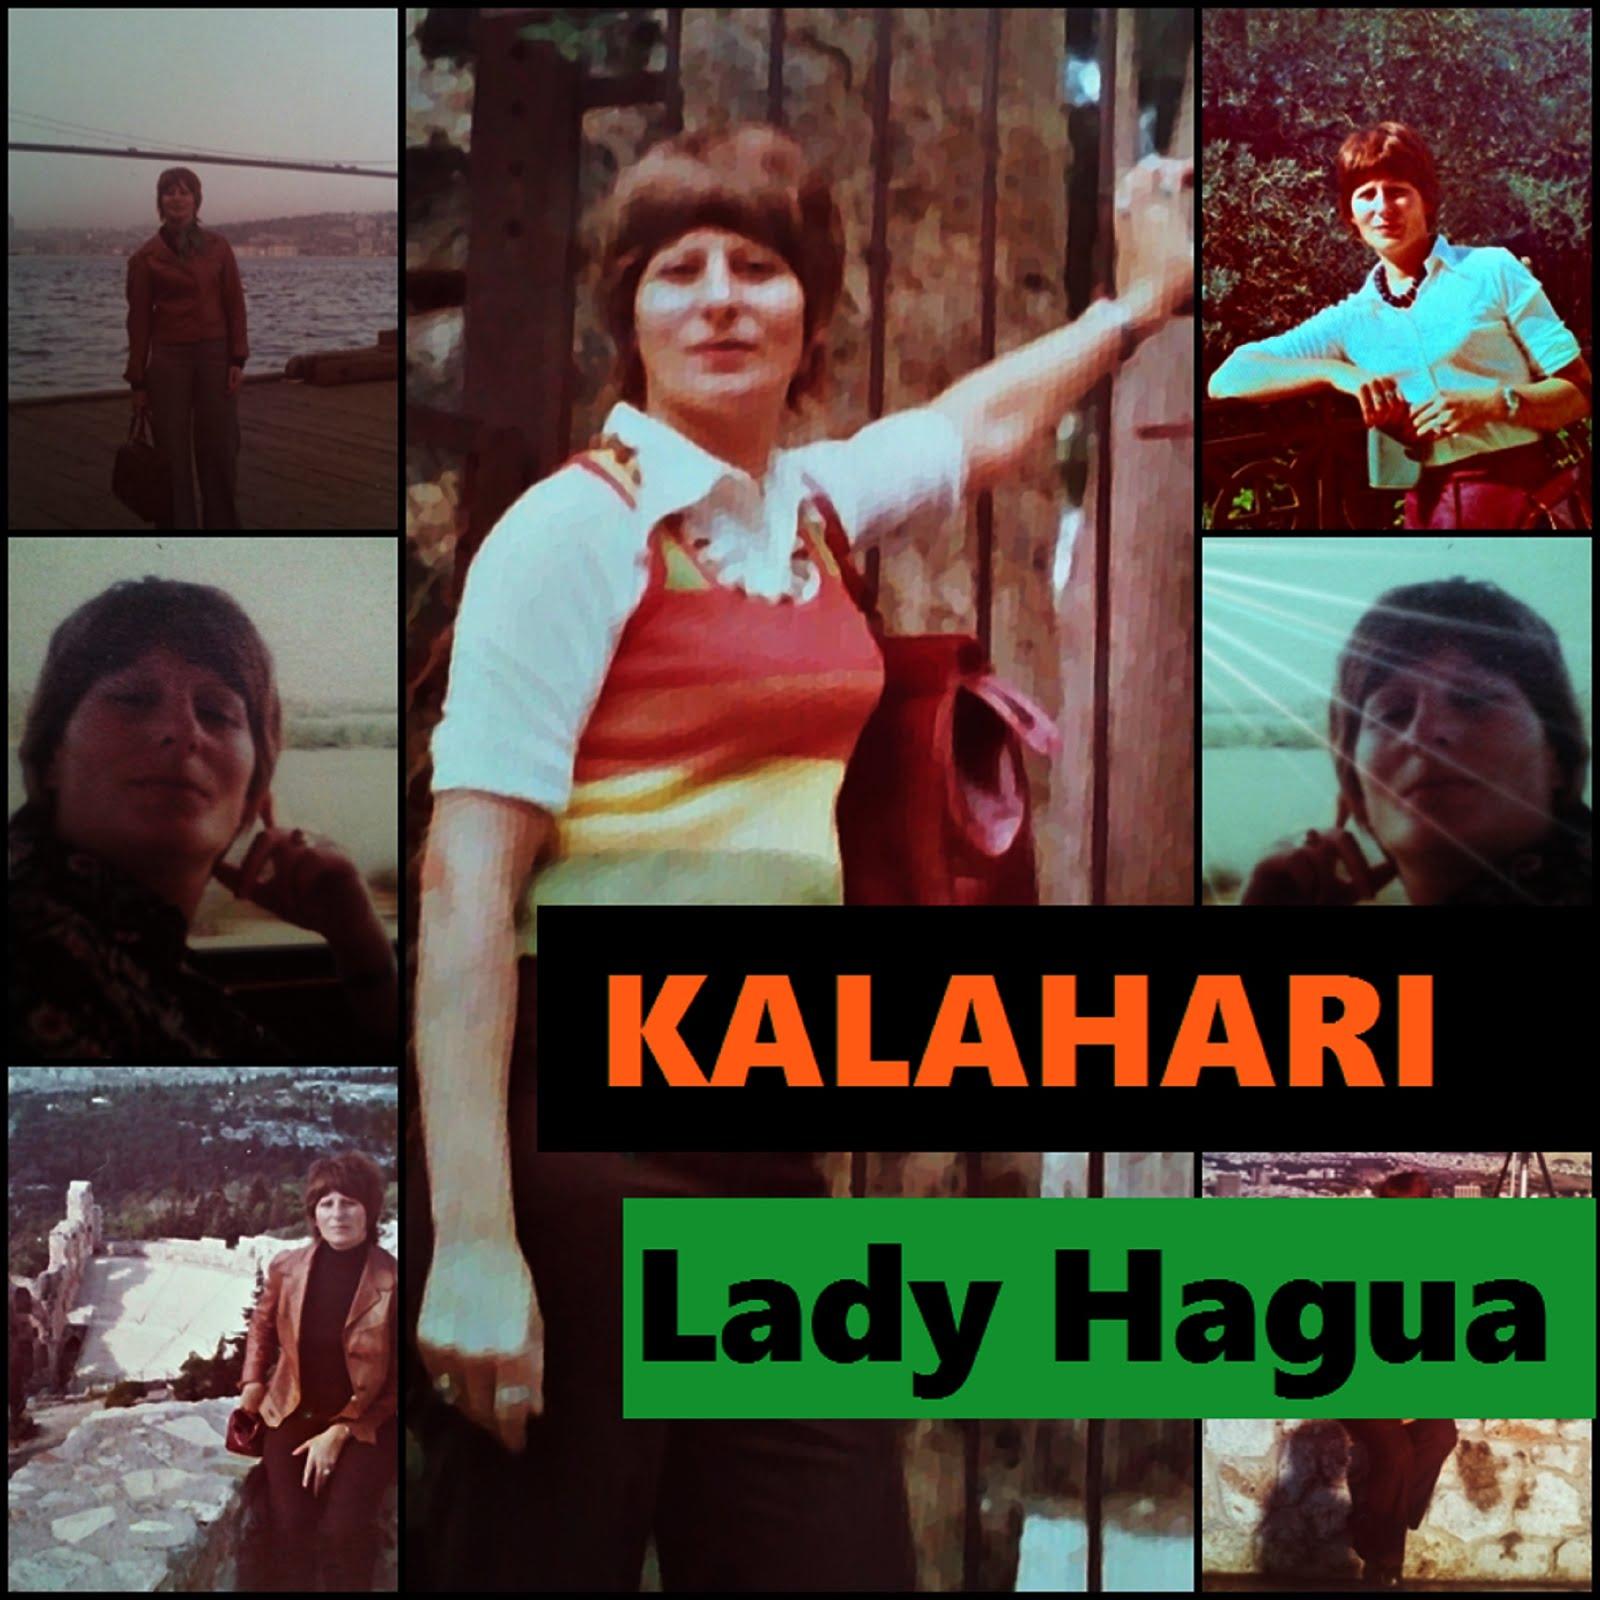 Canal de LADY HAGUA